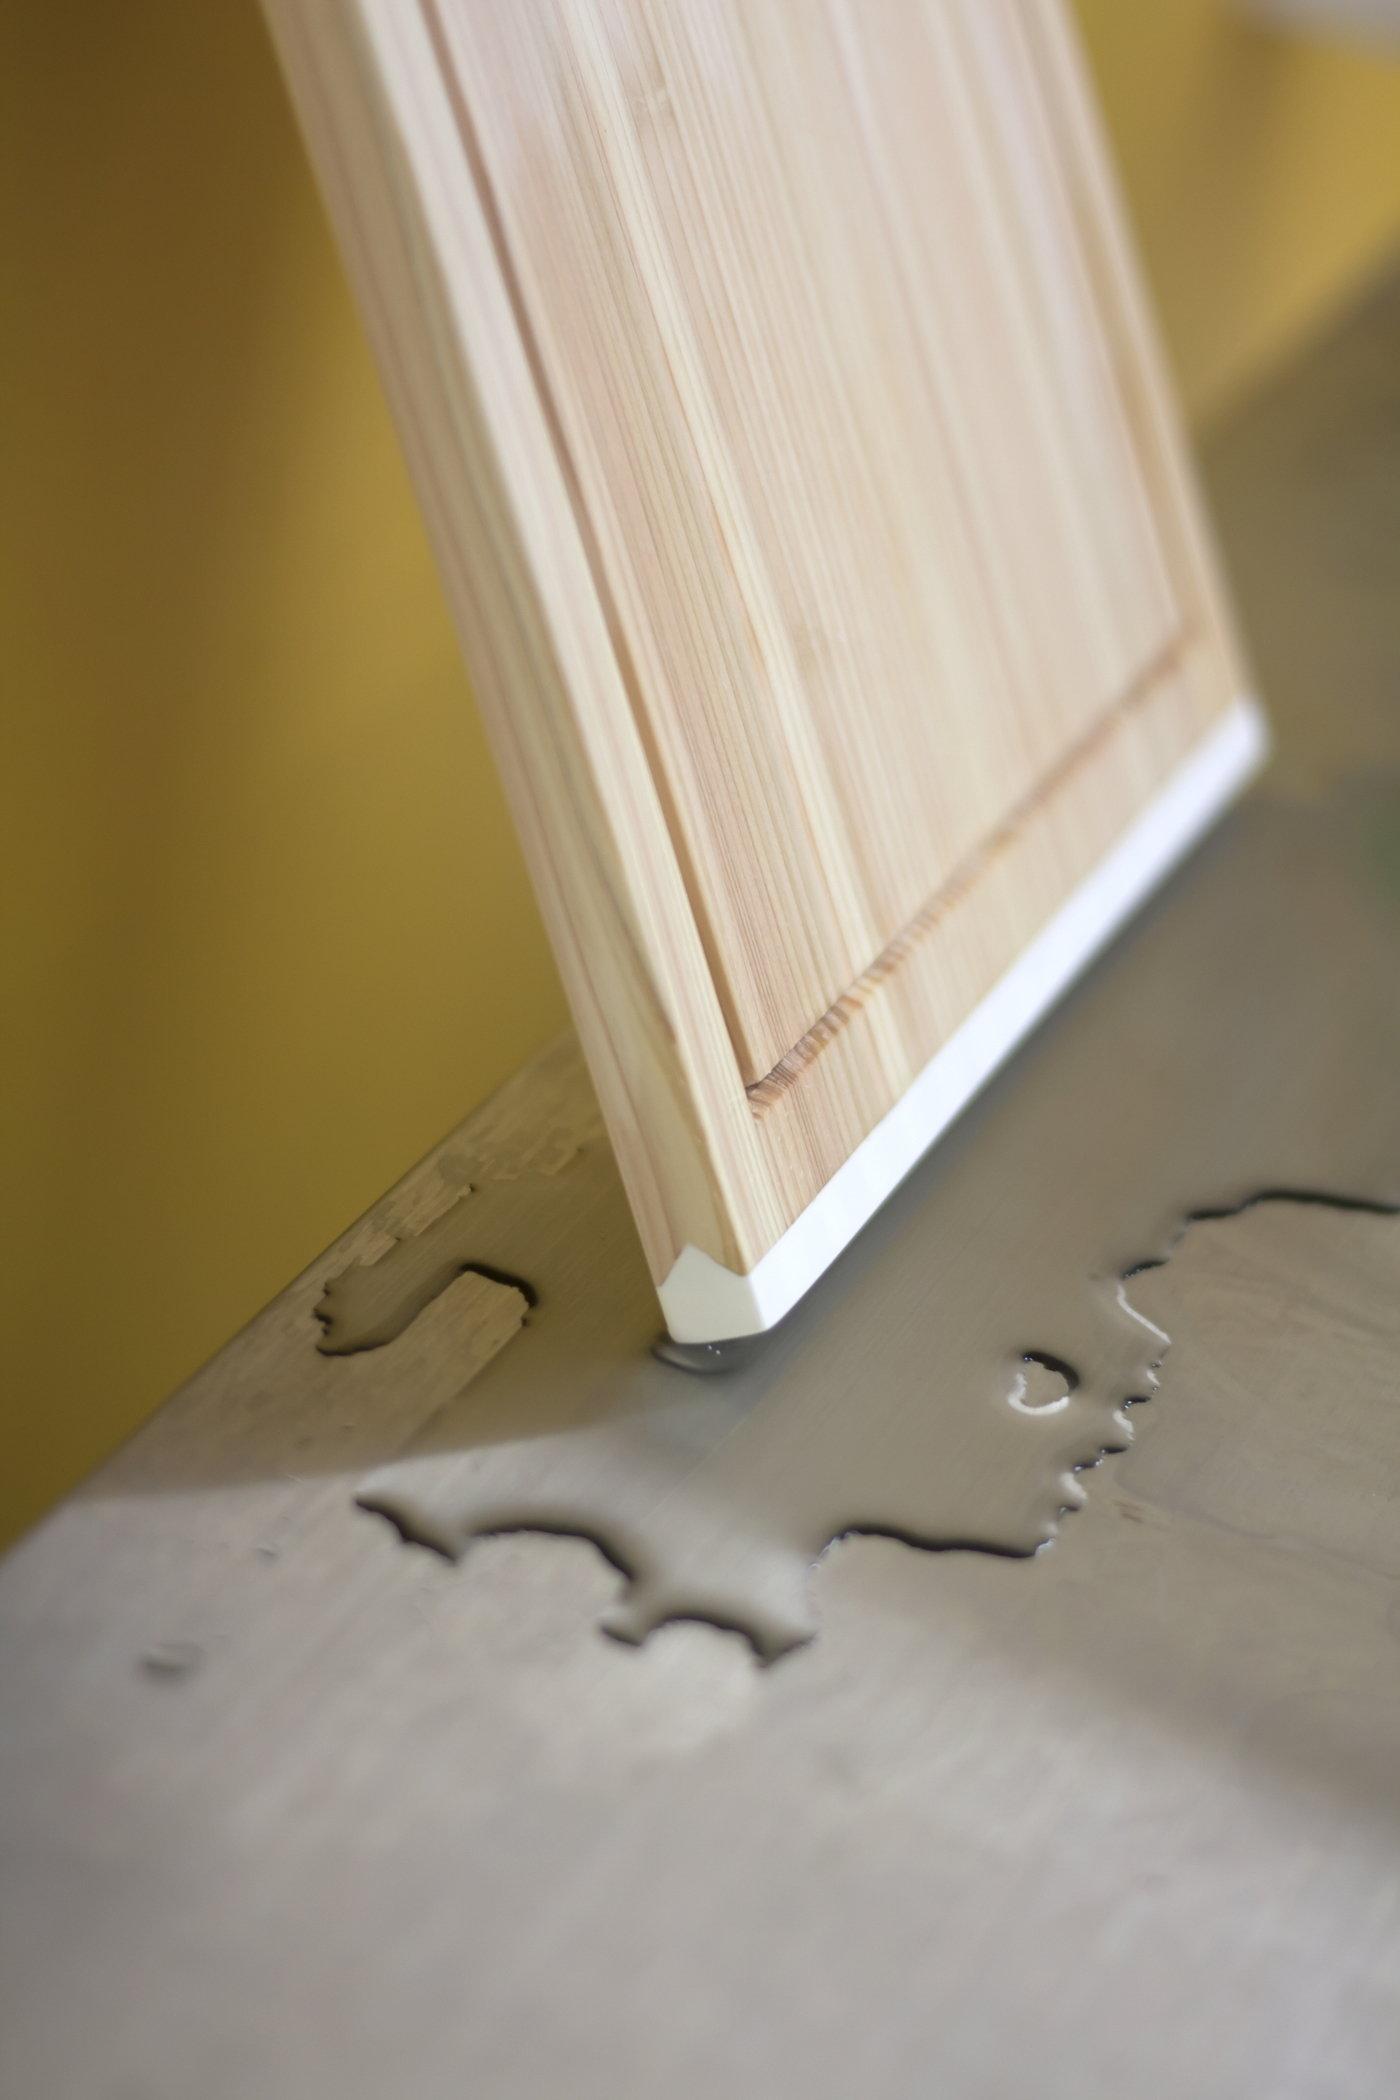 MUJI Cypress Cutting Board by Leslie Montes at Coroflot com